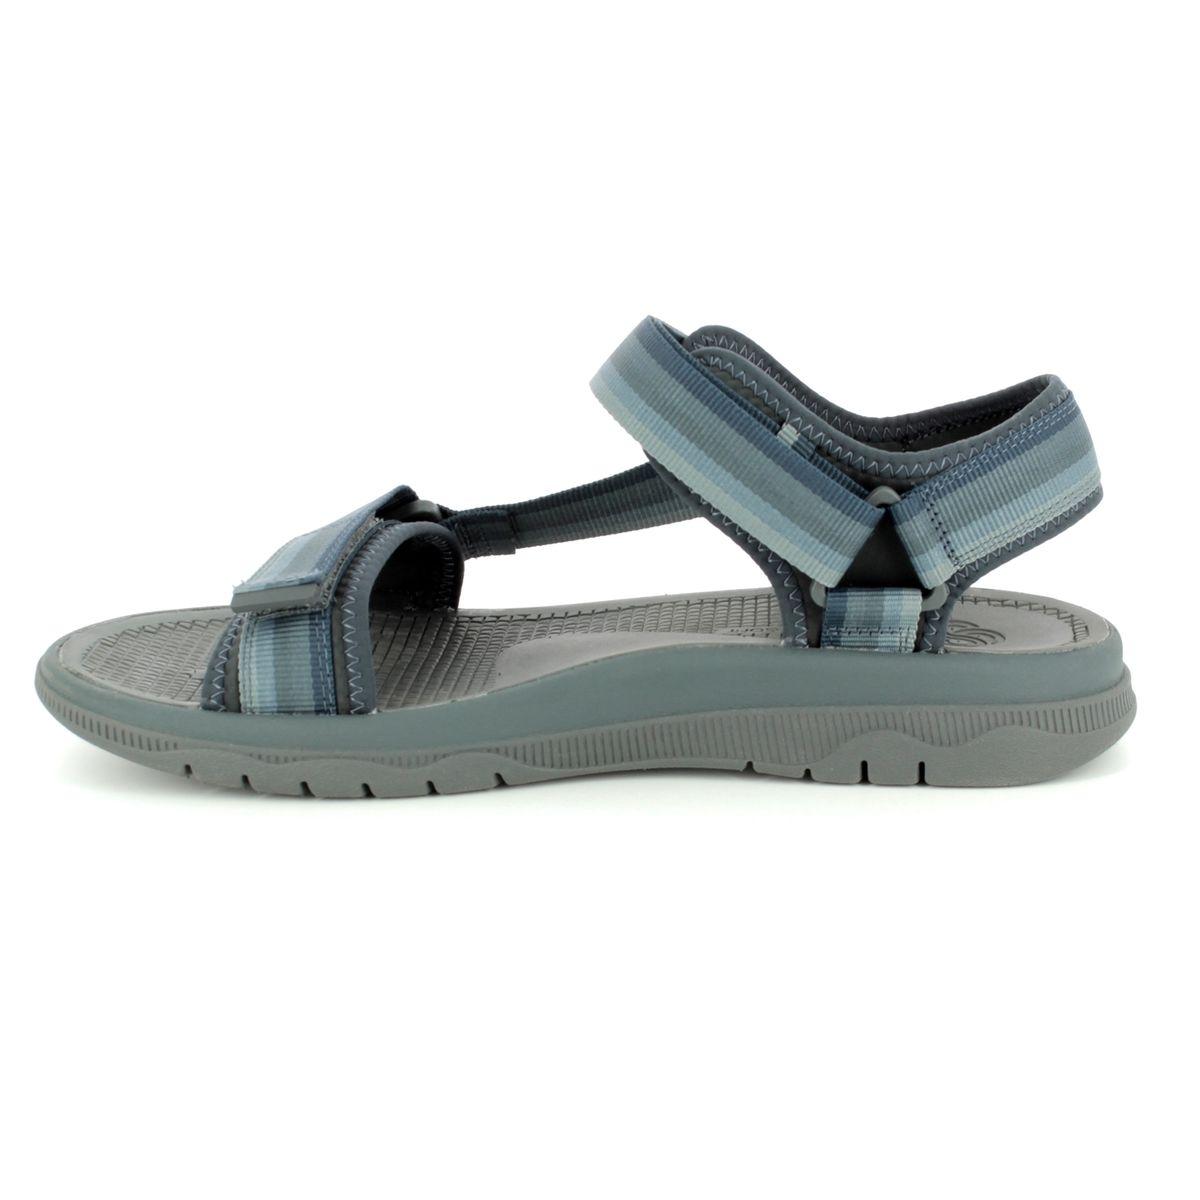 6bba1eb2ec5 Clarks Sandals - Grey - 3279 67G BALTA REEF